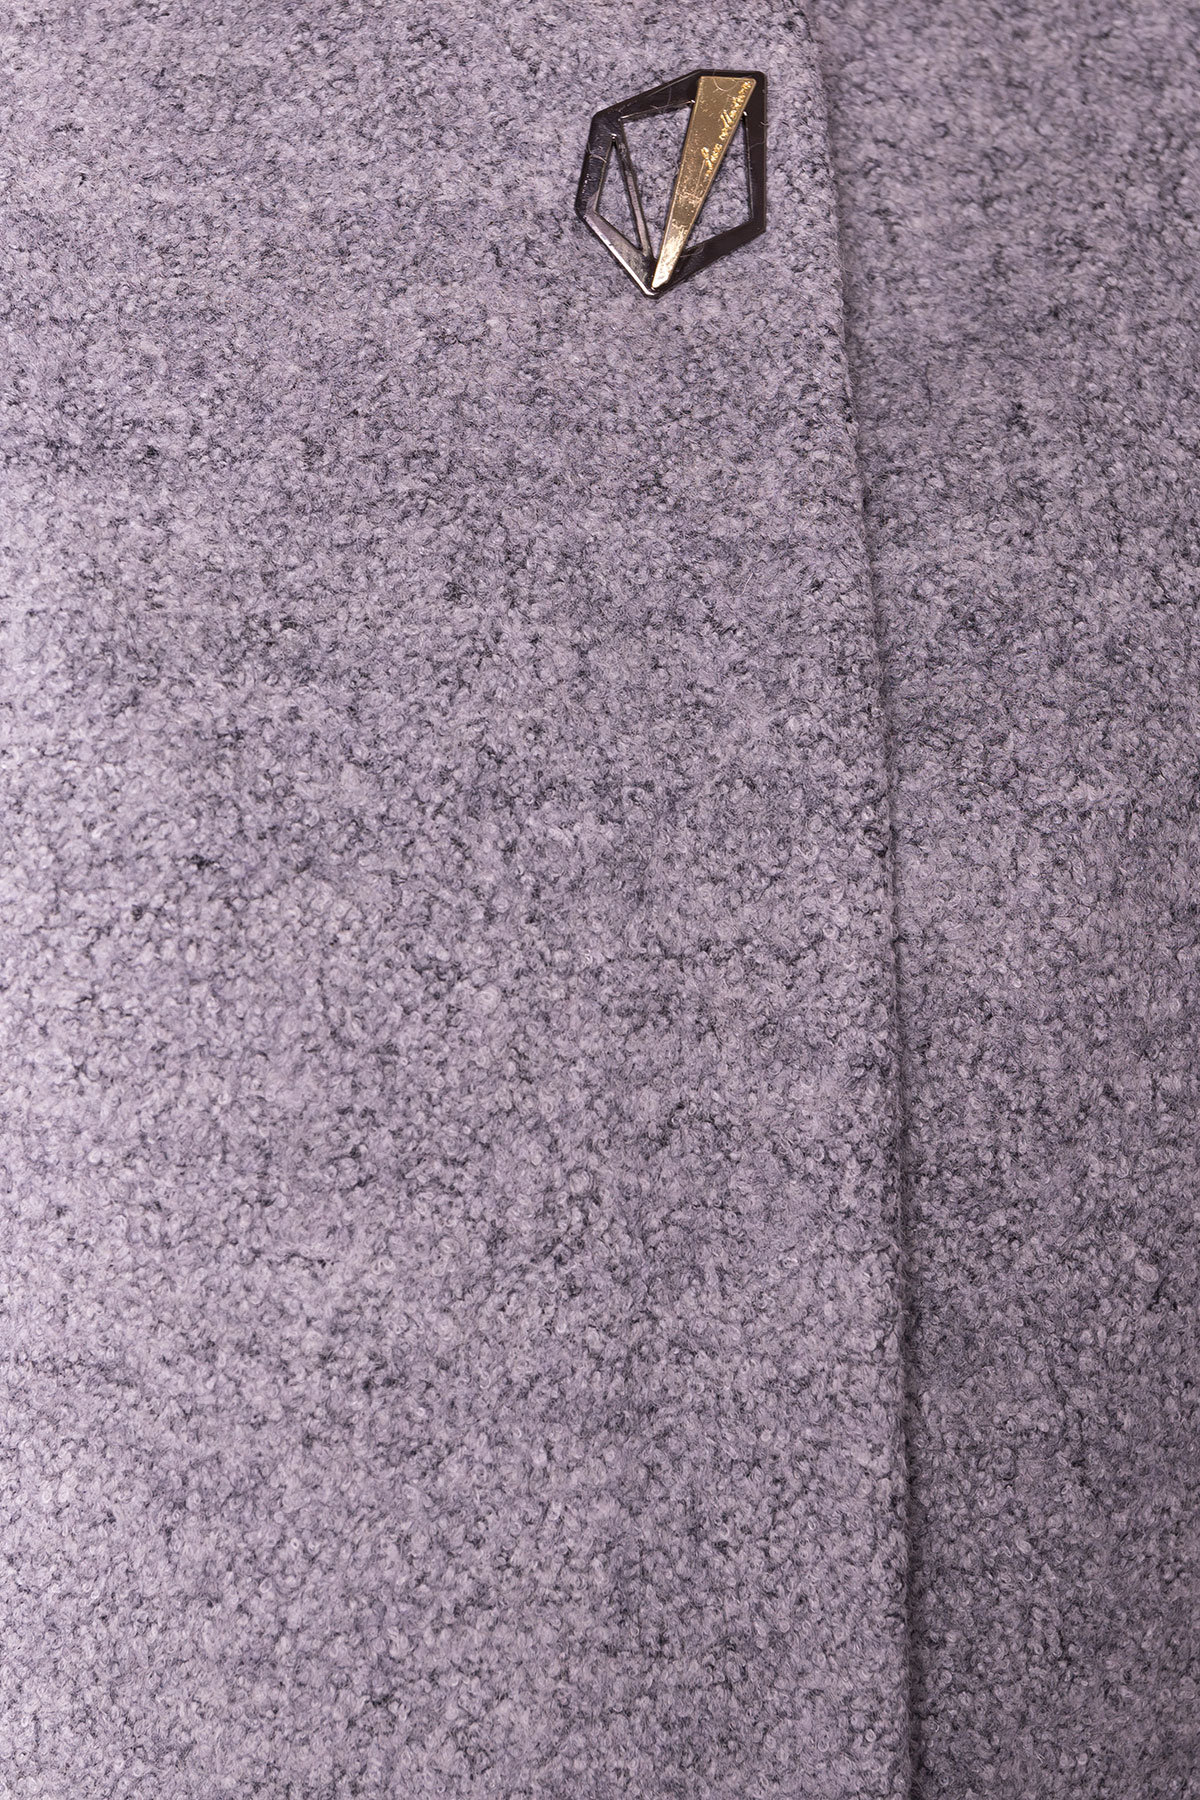 Пальто Дакс 1679 АРТ. 9498 Цвет: Серый 48 - фото 4, интернет магазин tm-modus.ru